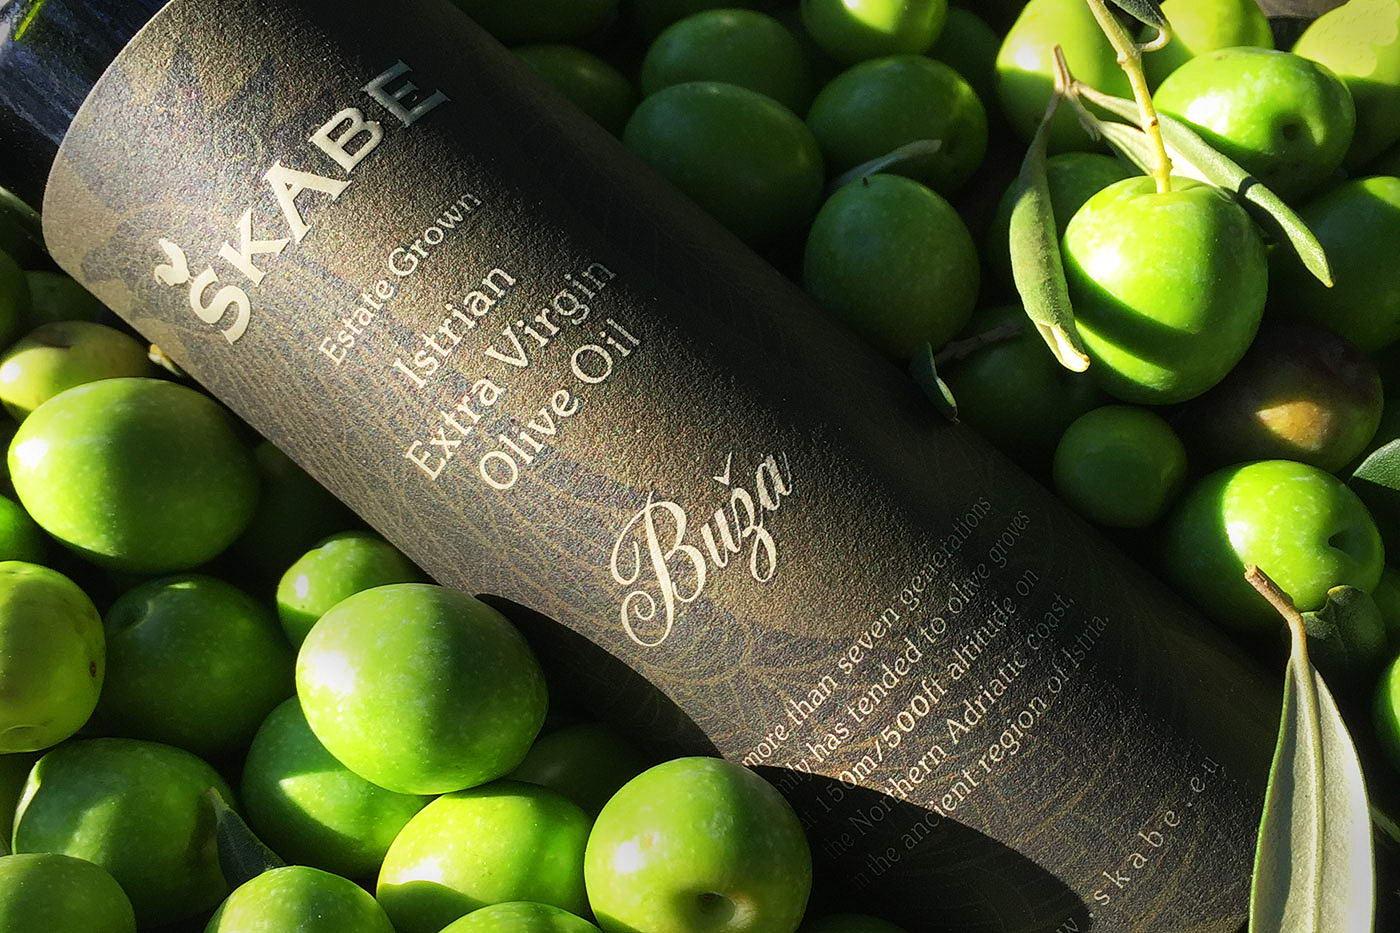 Skabe - Istrian Extra Virgin Olive Oil